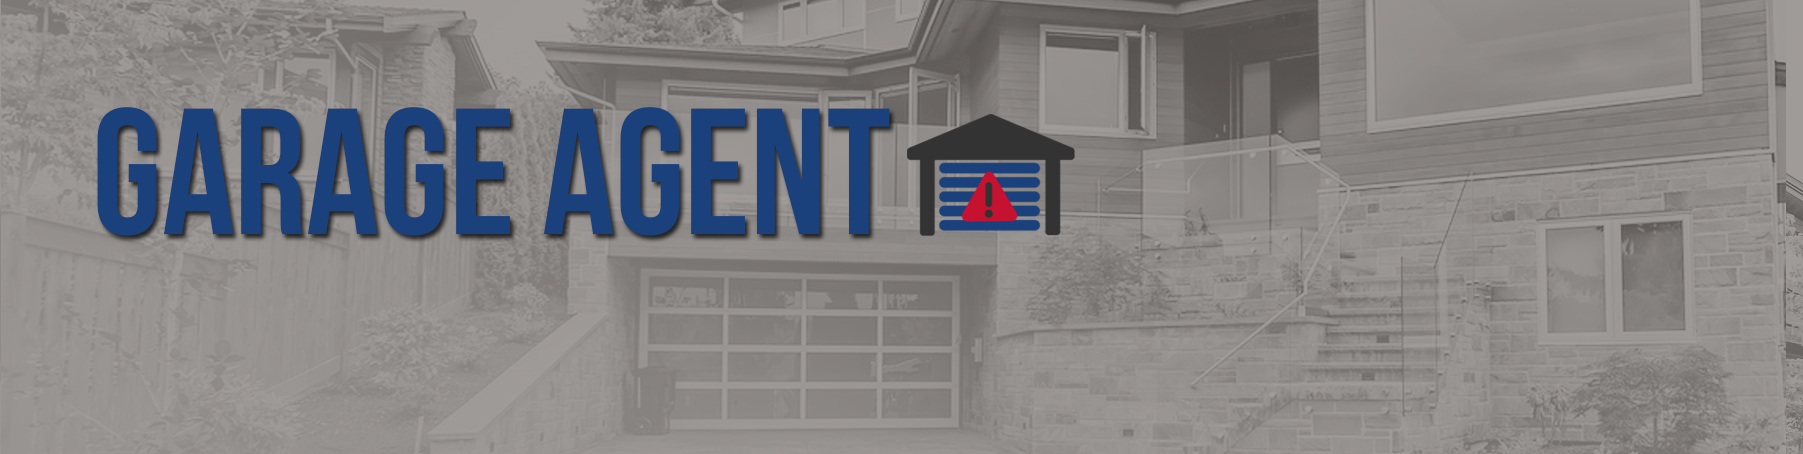 Garage%20Agent.png?1545161448309